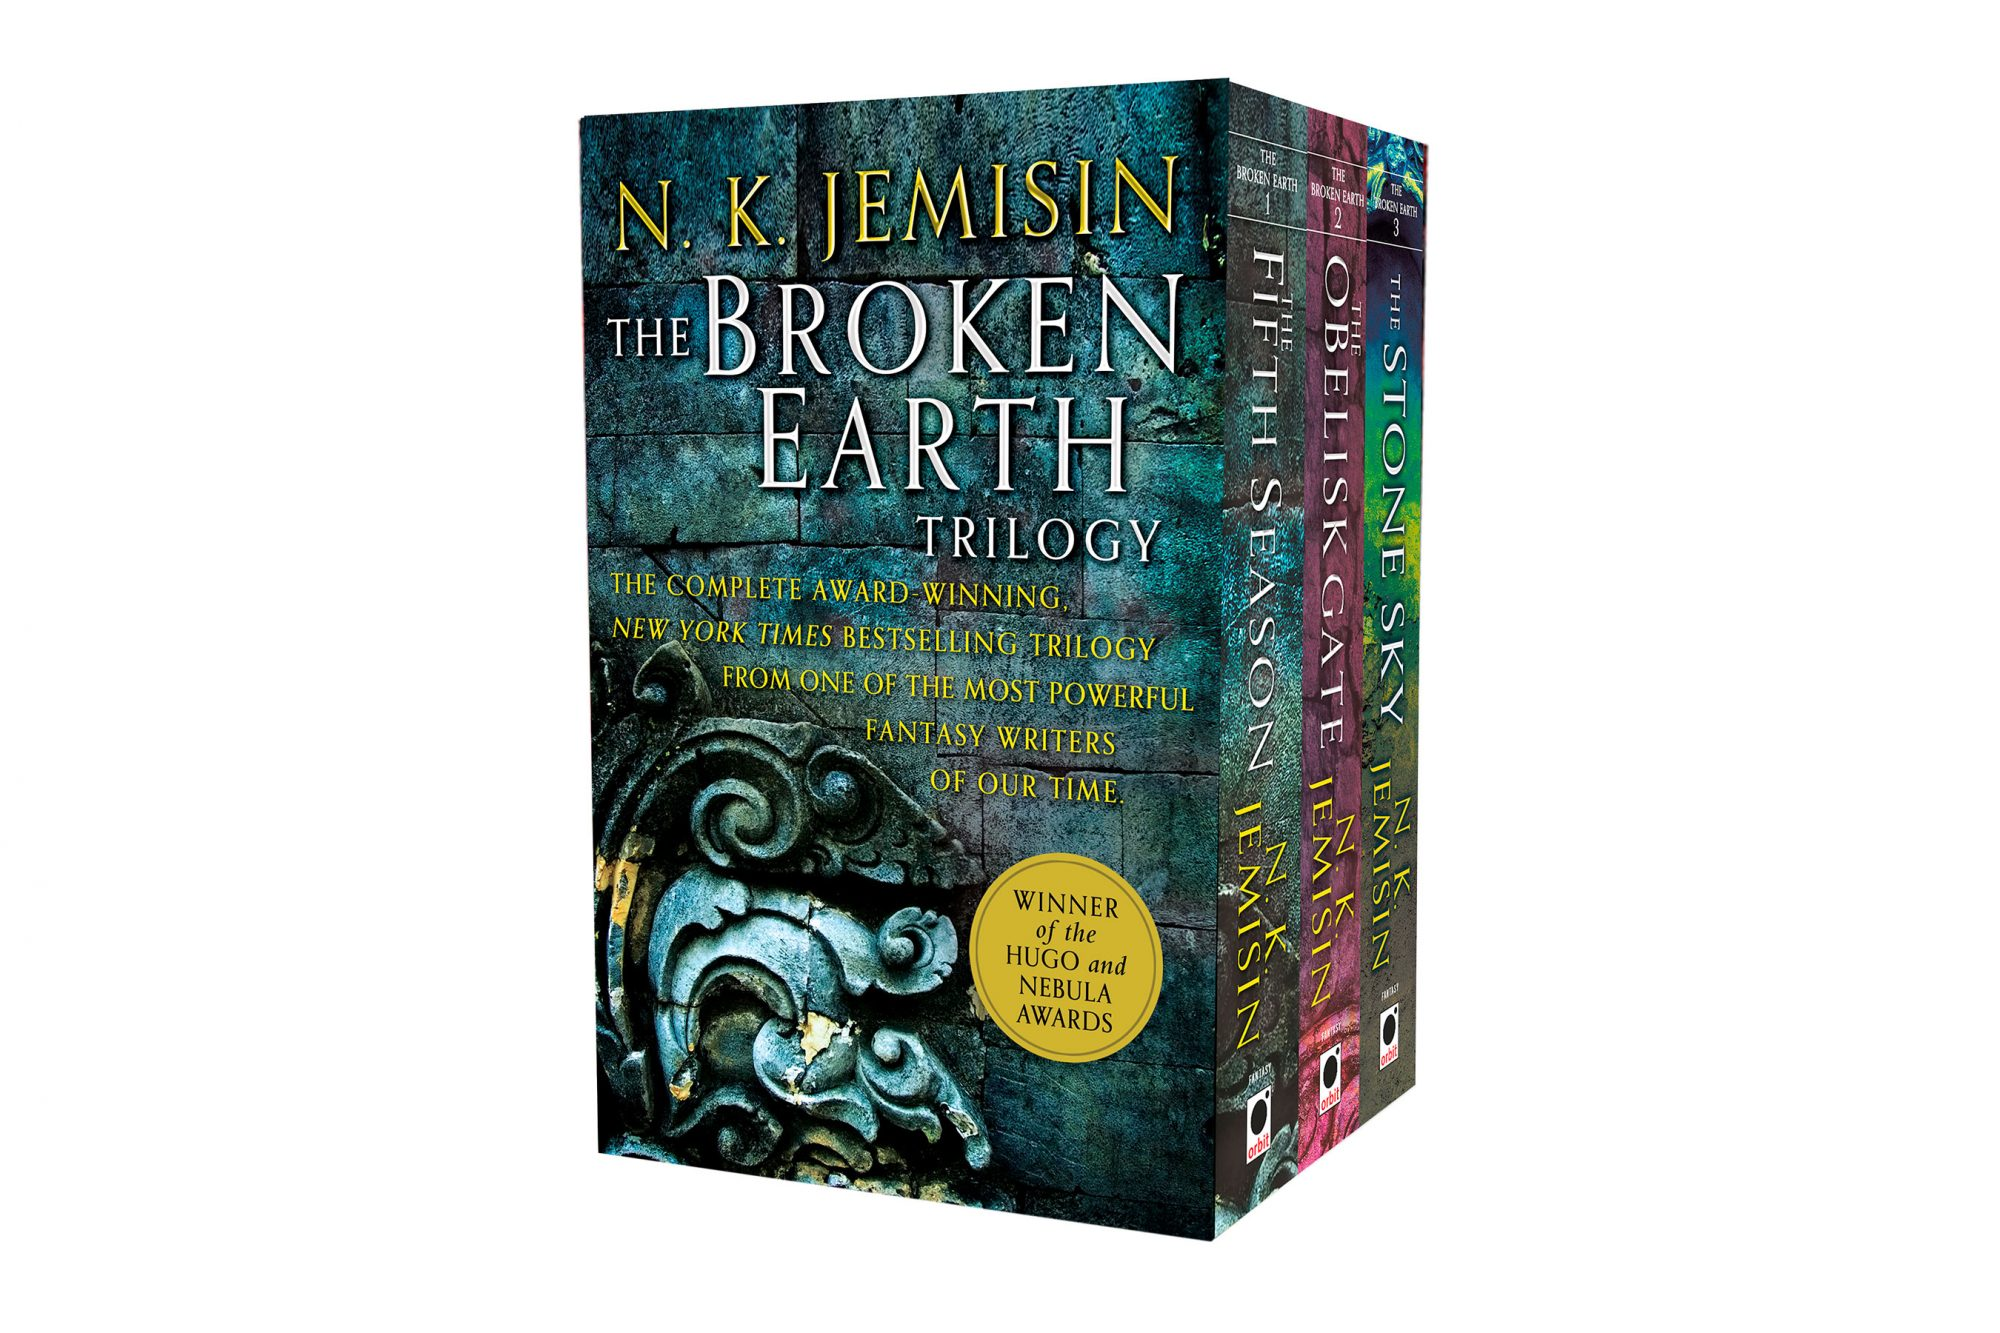 THE BROKEN EARTH TRILOGY (Box Set)N.K. Jemisin